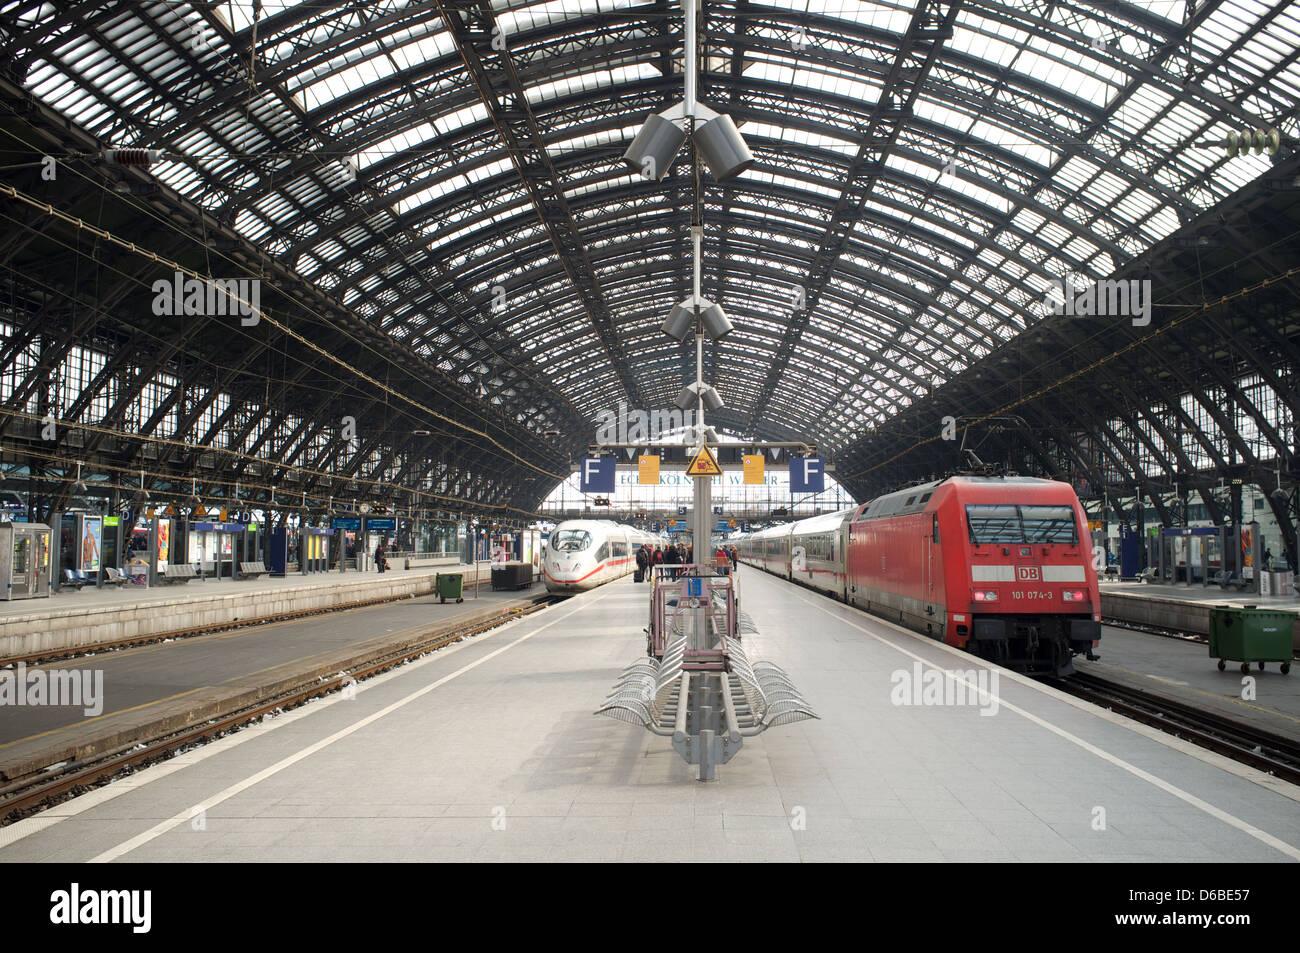 Cologne Hauptbahnhof railway station Germany - Stock Image